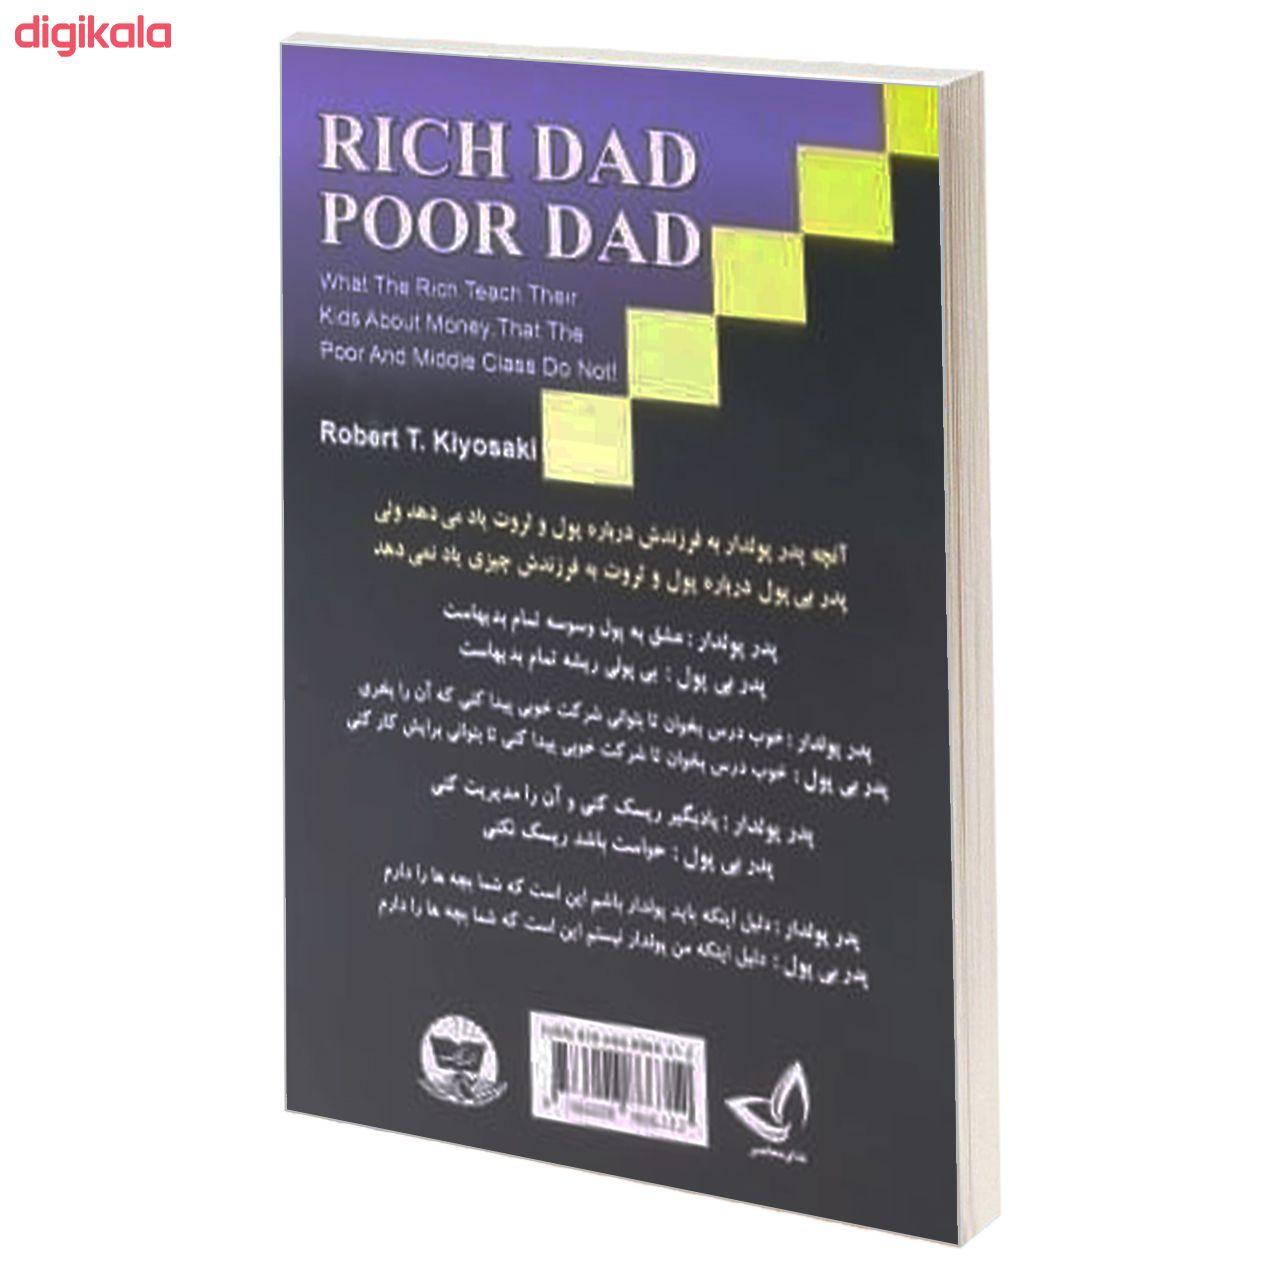 کتاب پدر پولدار پدر بی پول اثر رابرت کیوساکی انتشارات زرین کلک main 1 1